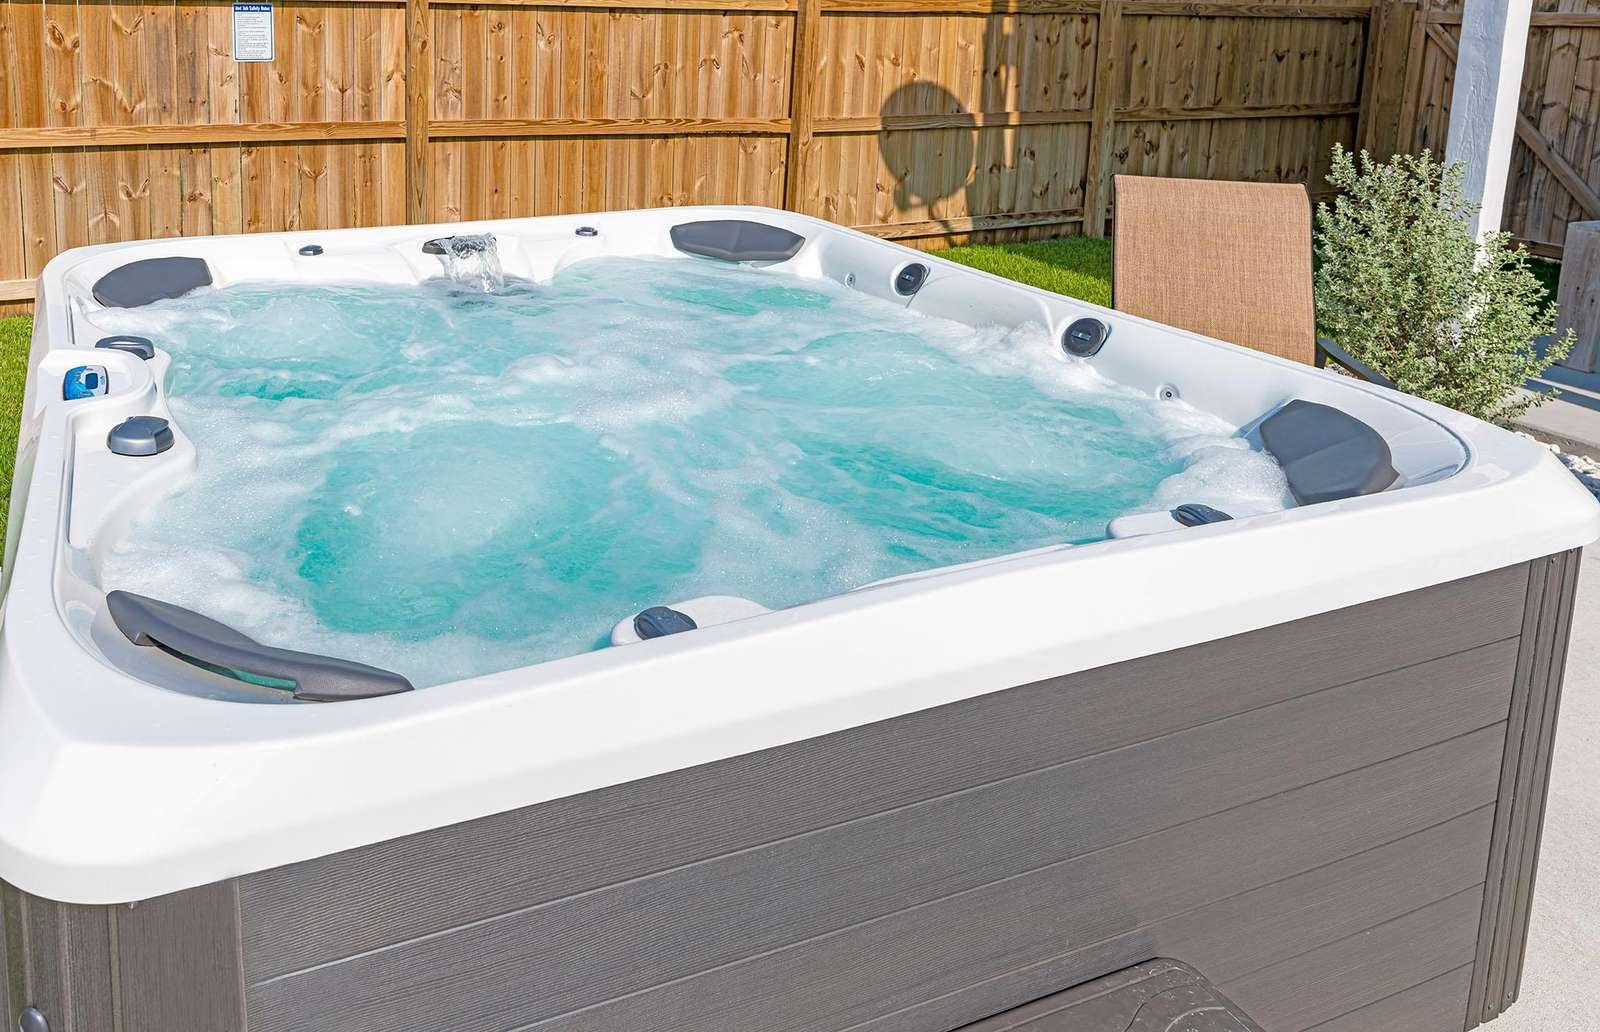 Spacious 7 person private hot tub!